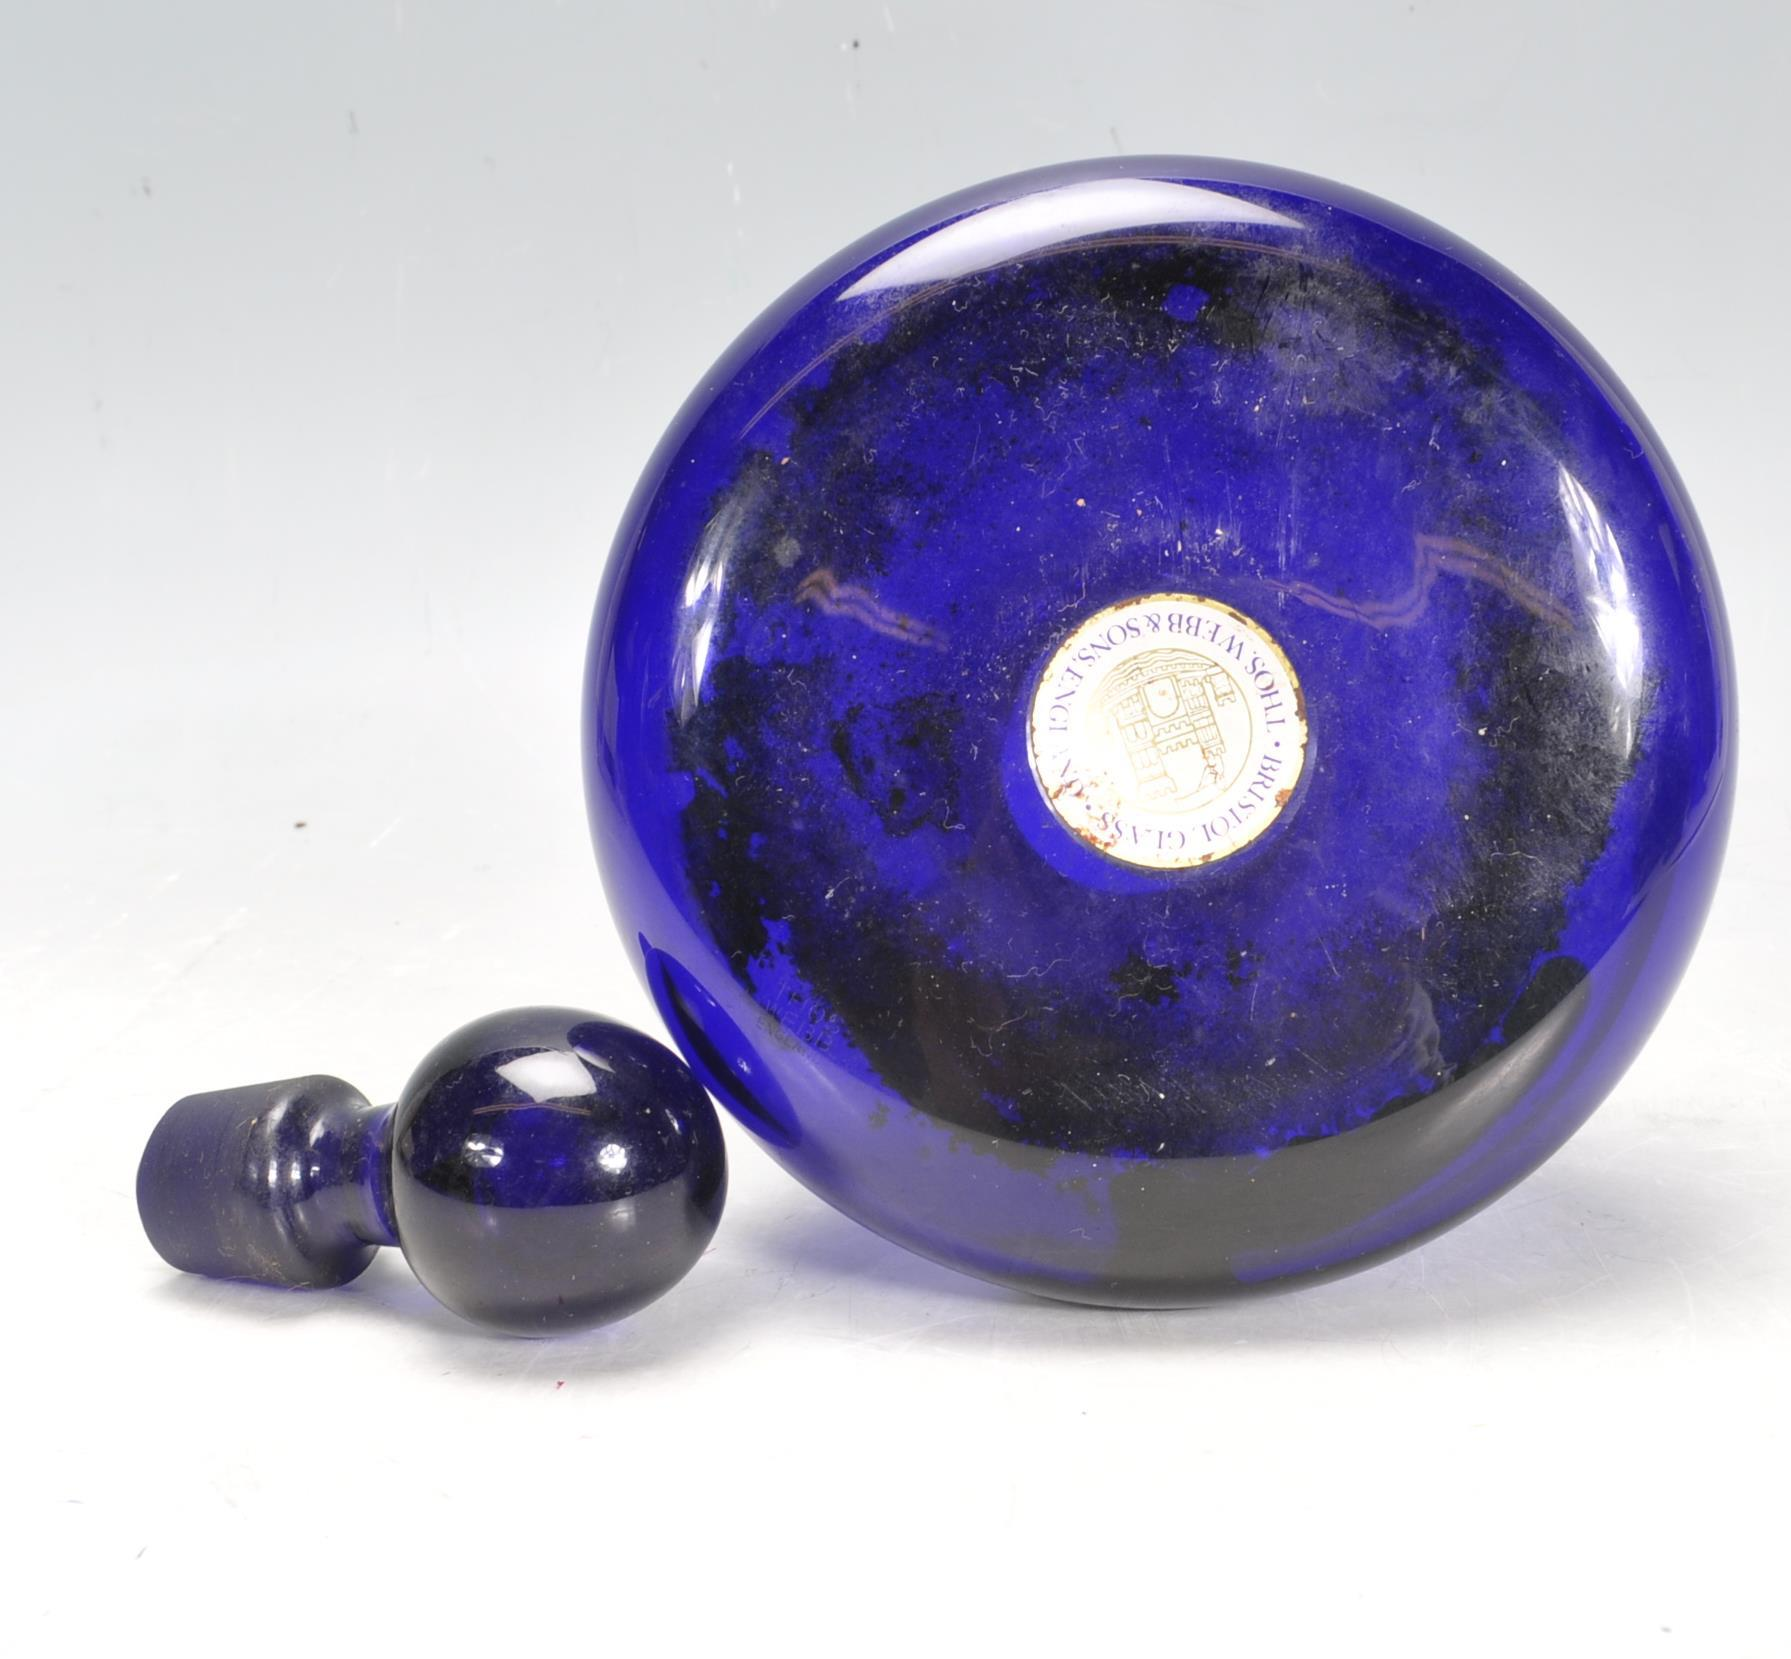 BRISTOL BLUE GLASS ORNAMENTS - Image 33 of 34